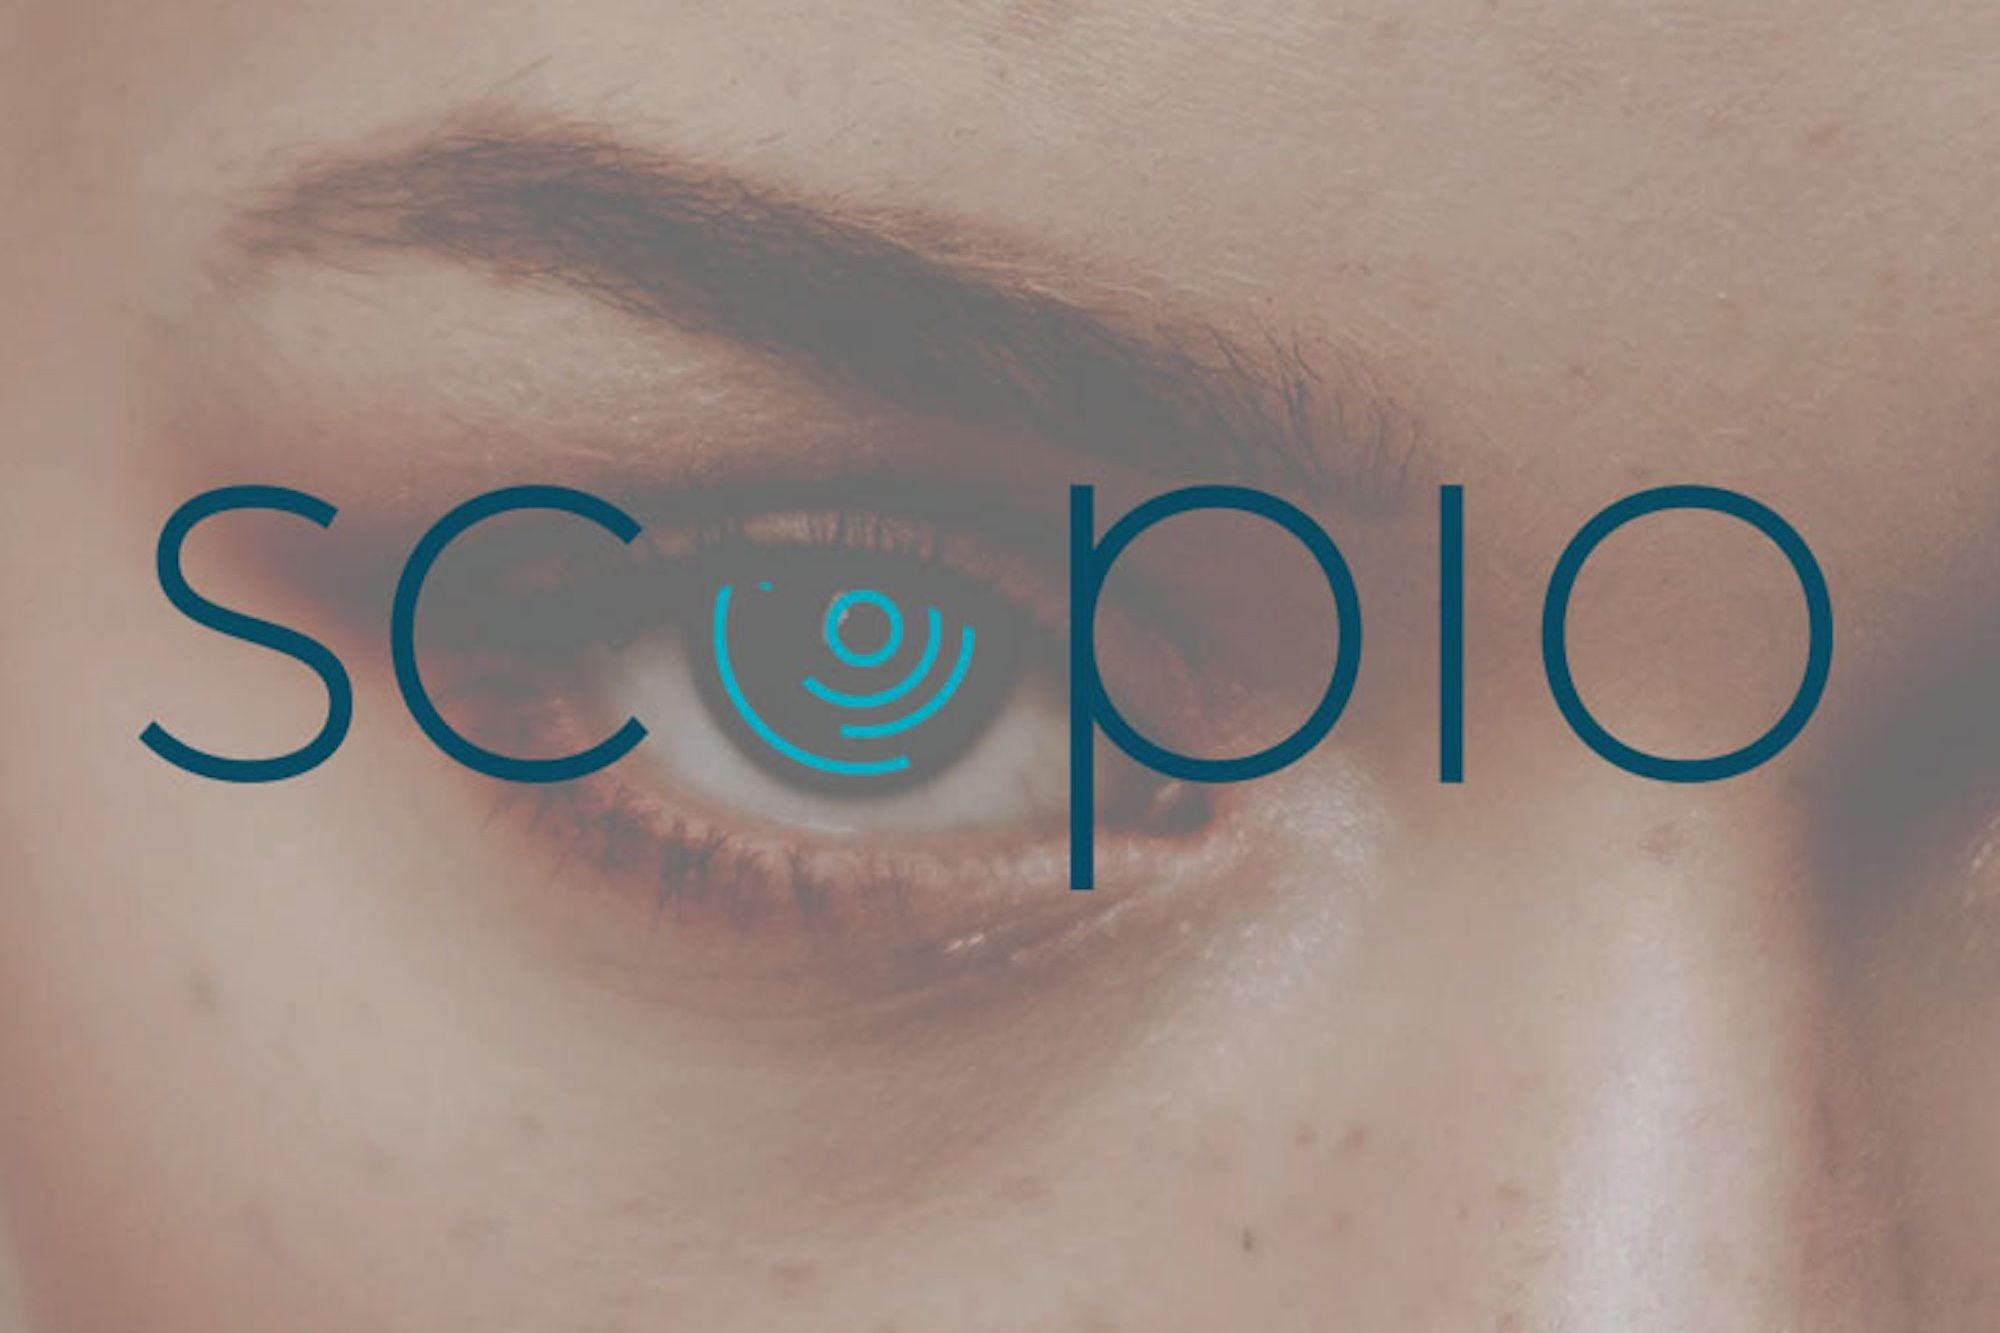 Scopio Gives You Elite Design Assets for a Bargain Price